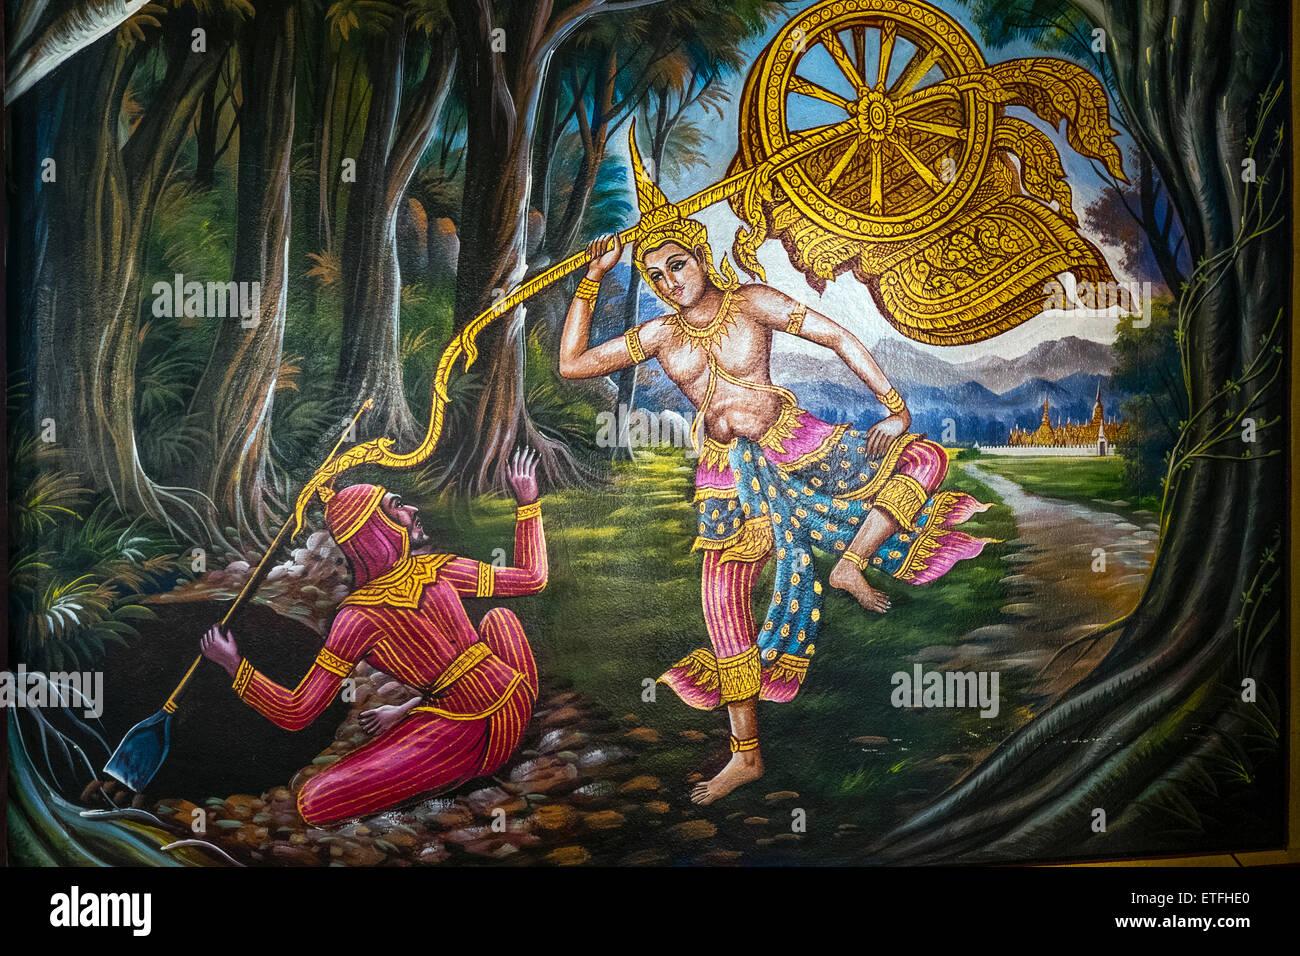 Asia. Thailand, Chiang Mai. Temple Wat Chiang Mun. Paintings illustrating the life of Buddha. - Stock Image